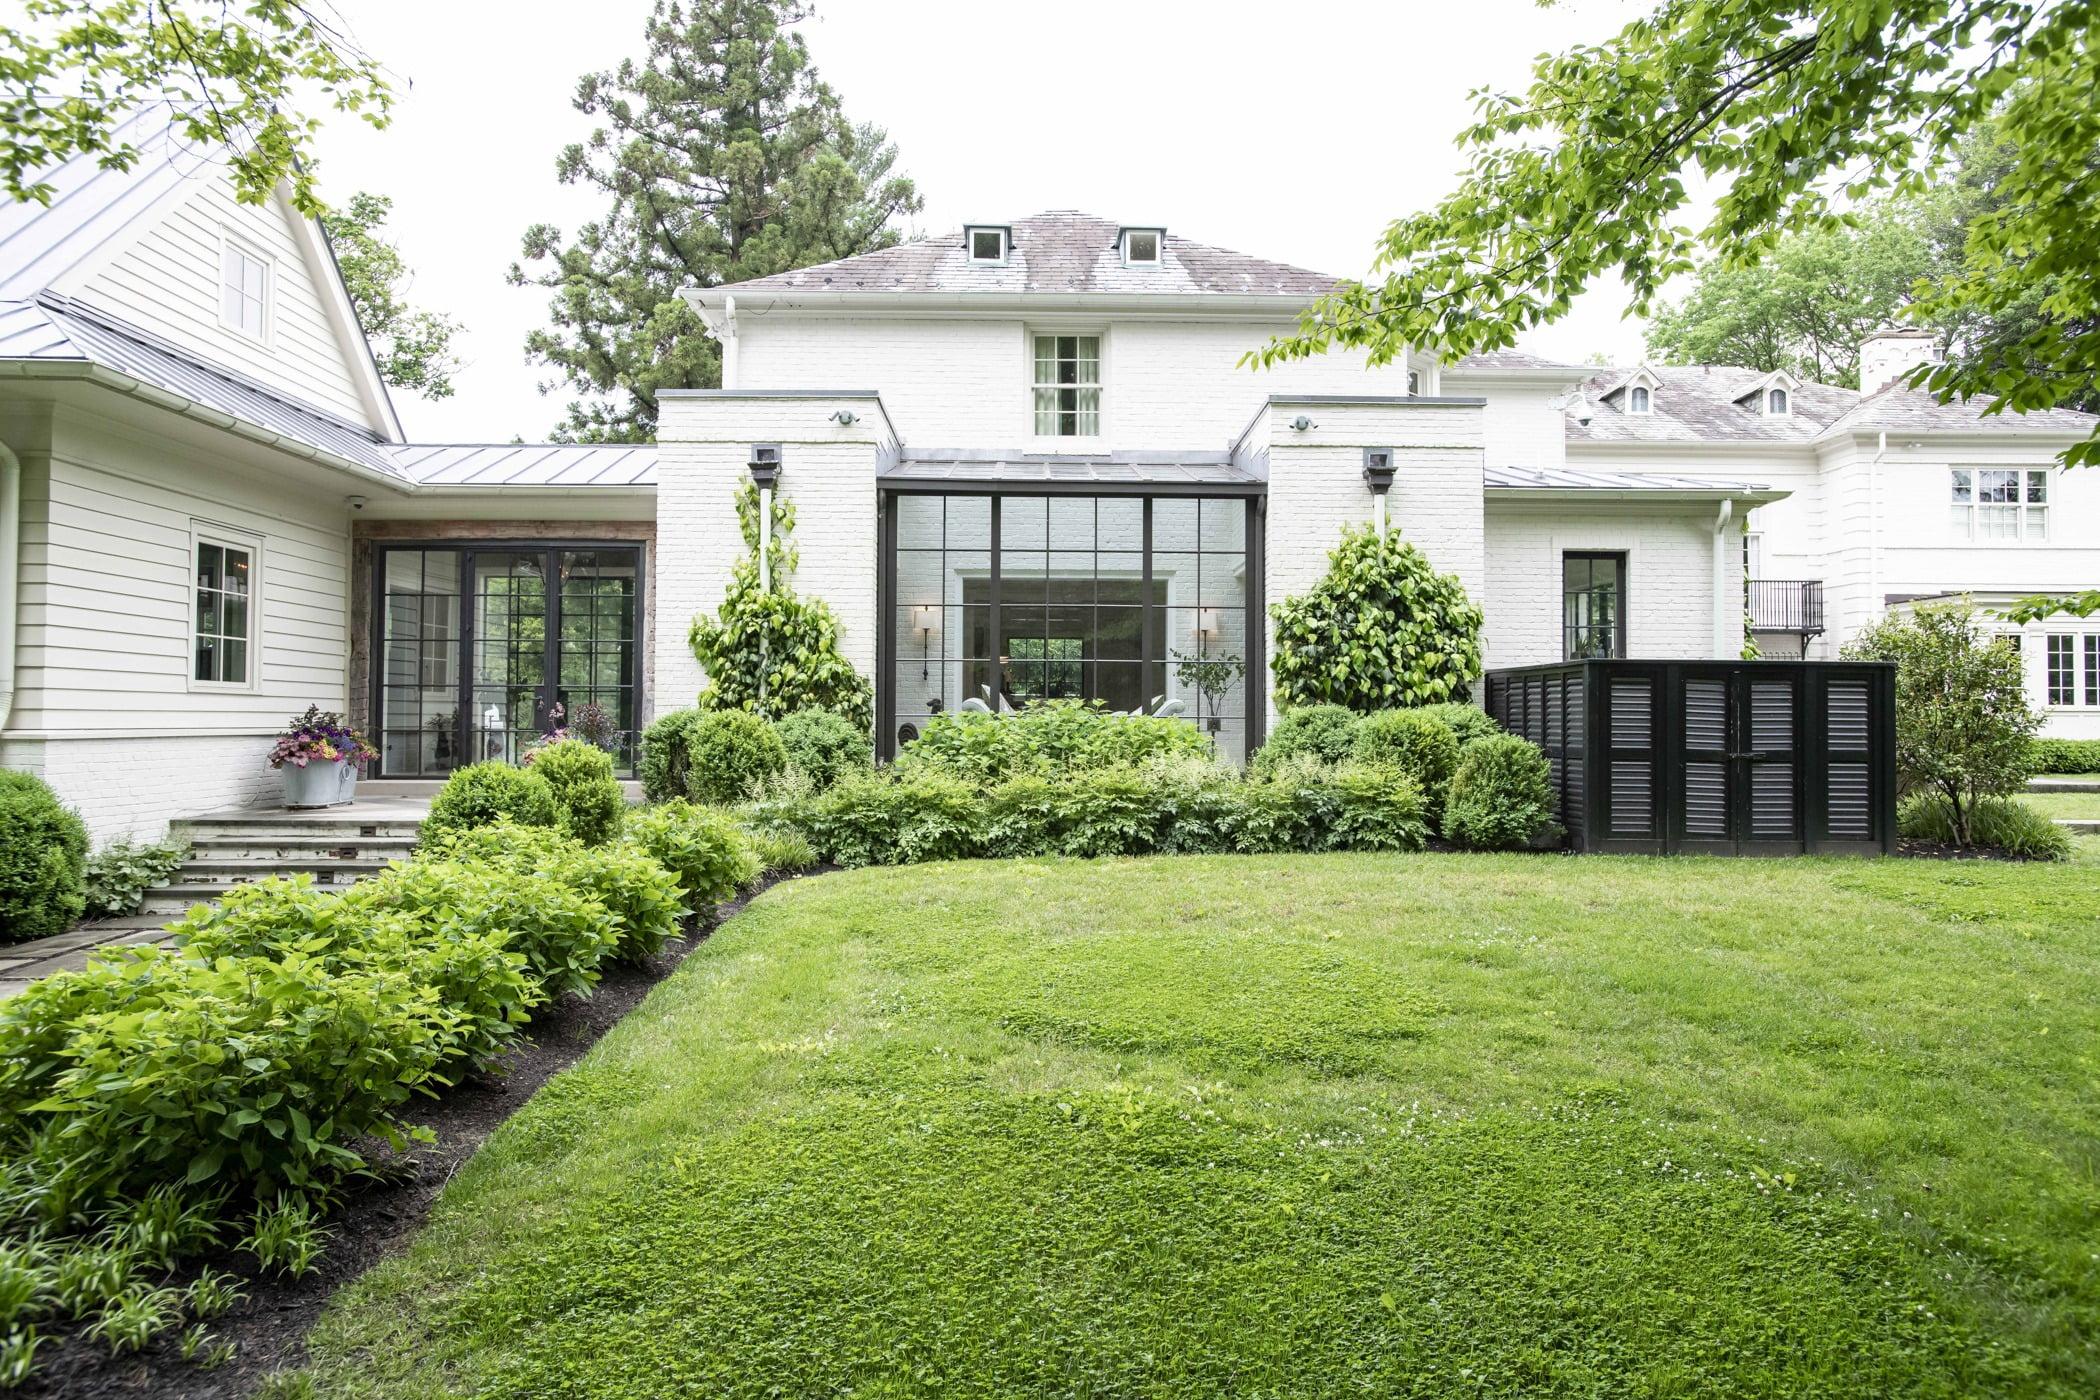 Shattuck house backyard greenery